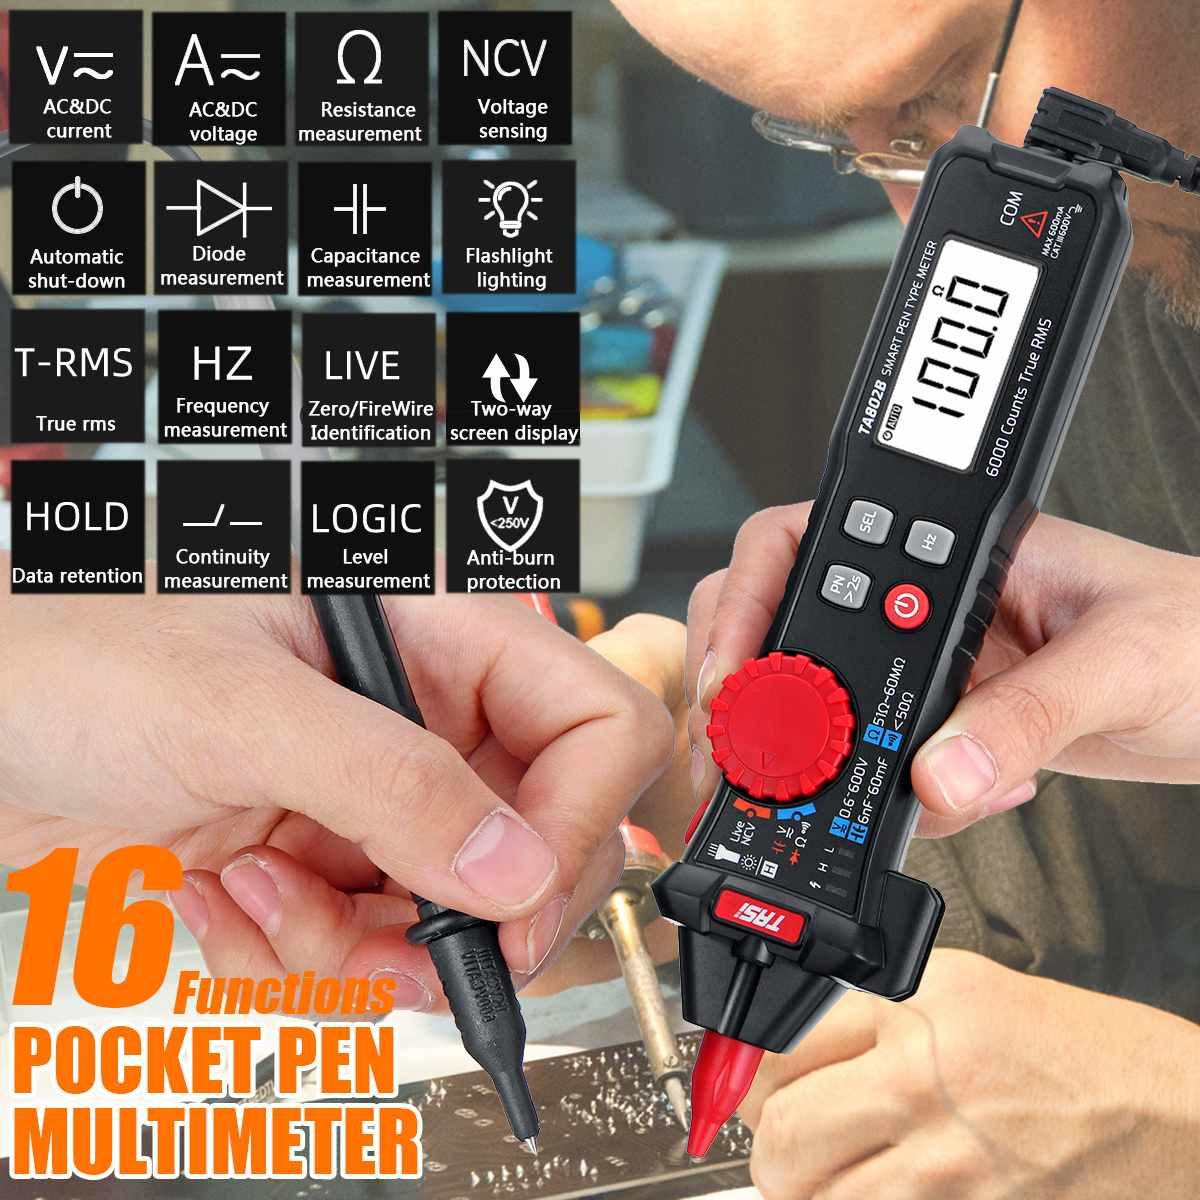 Digital multimeter True RMS 6000 Counts Digital Display Pocket Pen Multimeter High Precision Smart Multimeter Automatic Range